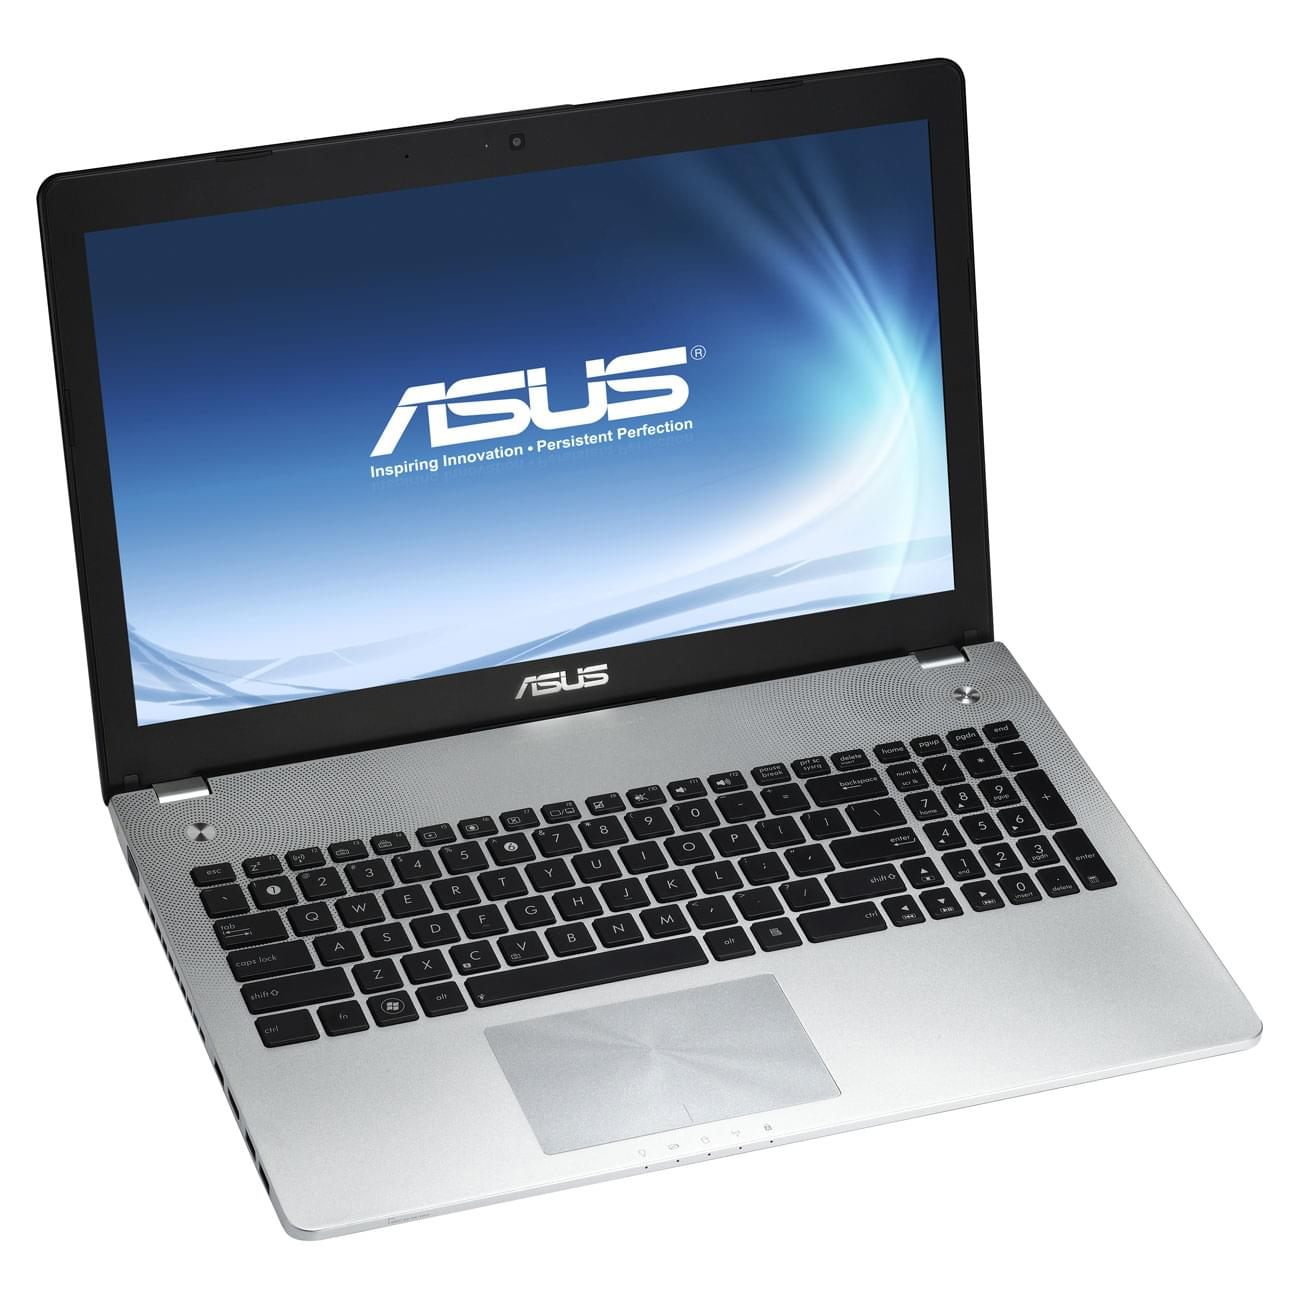 Asus N56VZ-S4023V (N56VZ-S4023V) - Achat / Vente PC Portable sur Cybertek.fr - 0